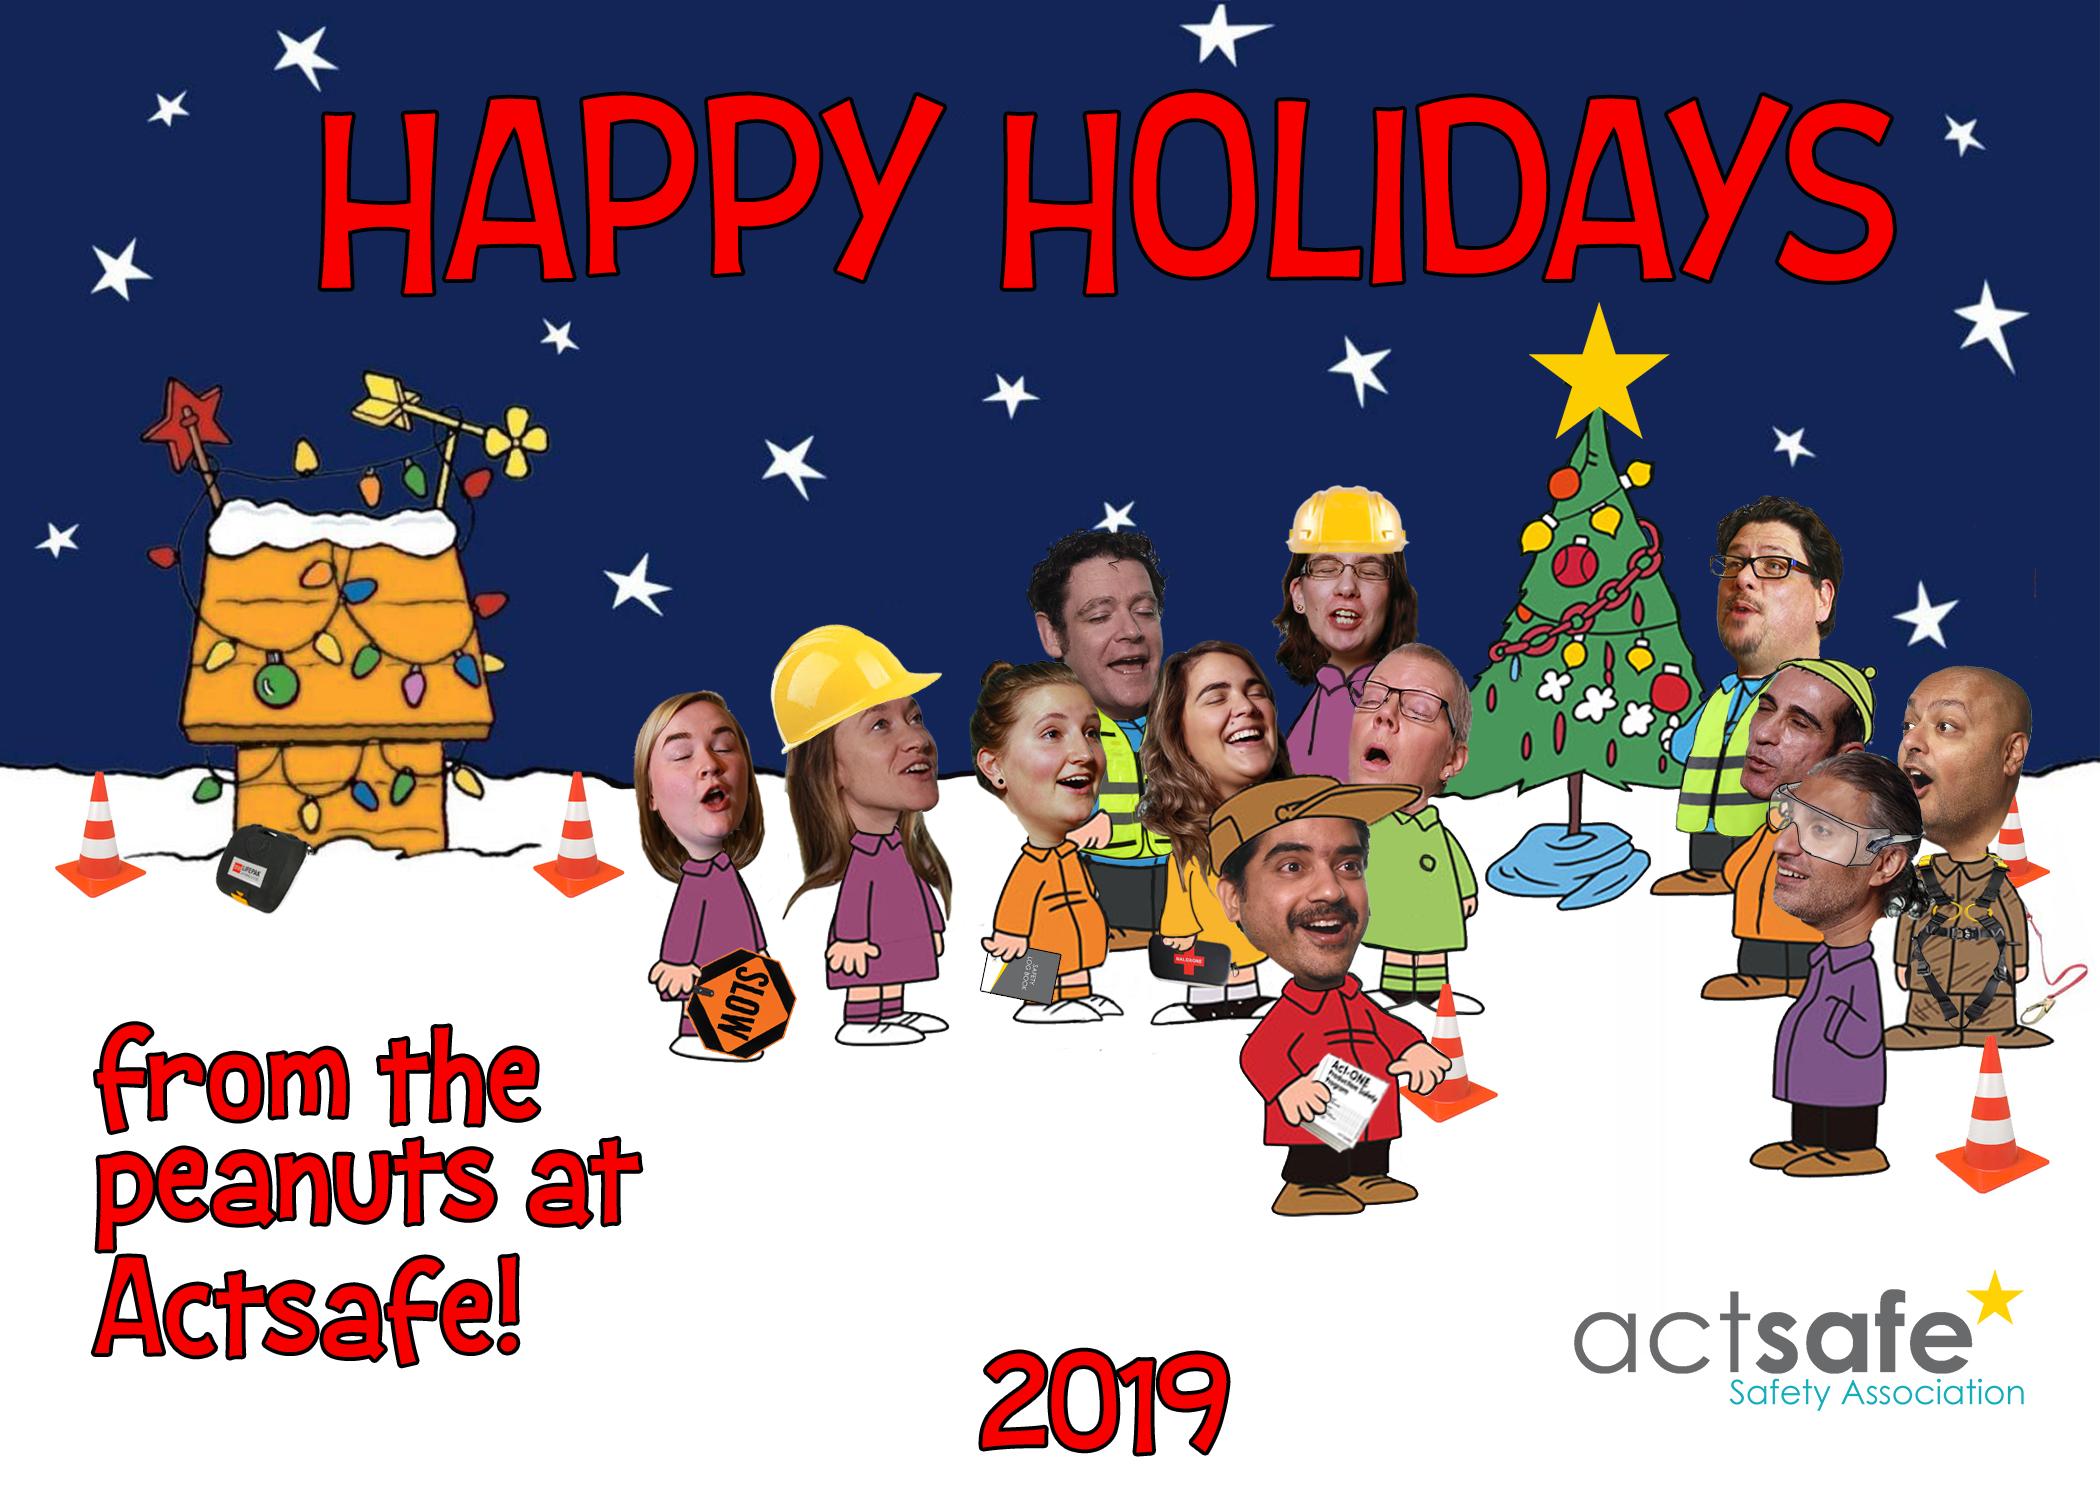 Actsafe Christmas Card 2019